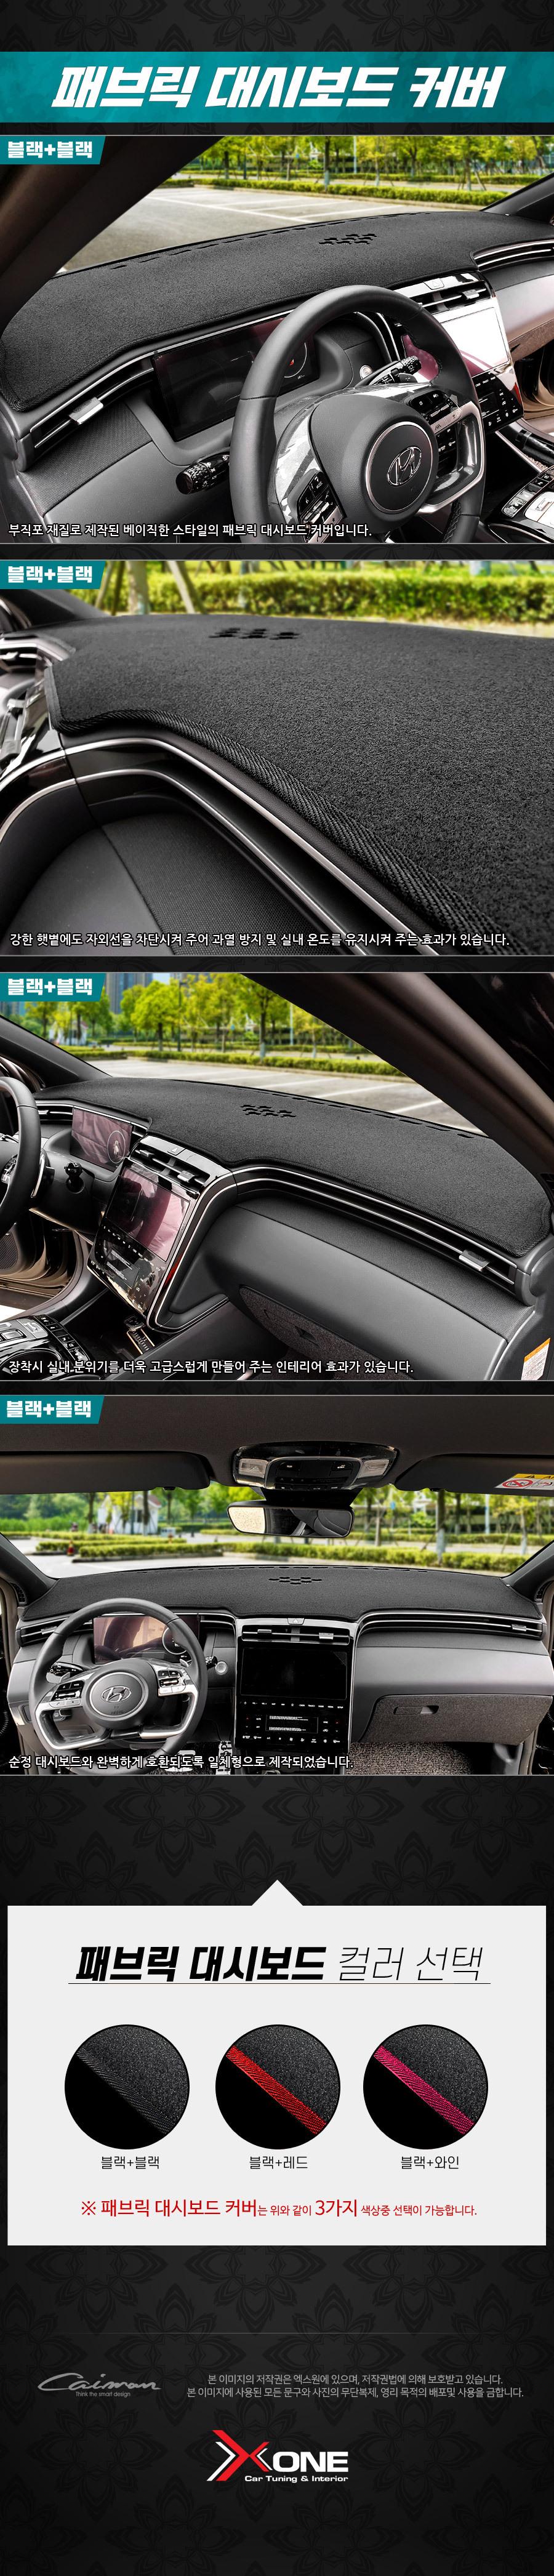 tucson-nx2-dash-board-cover_05.jpg